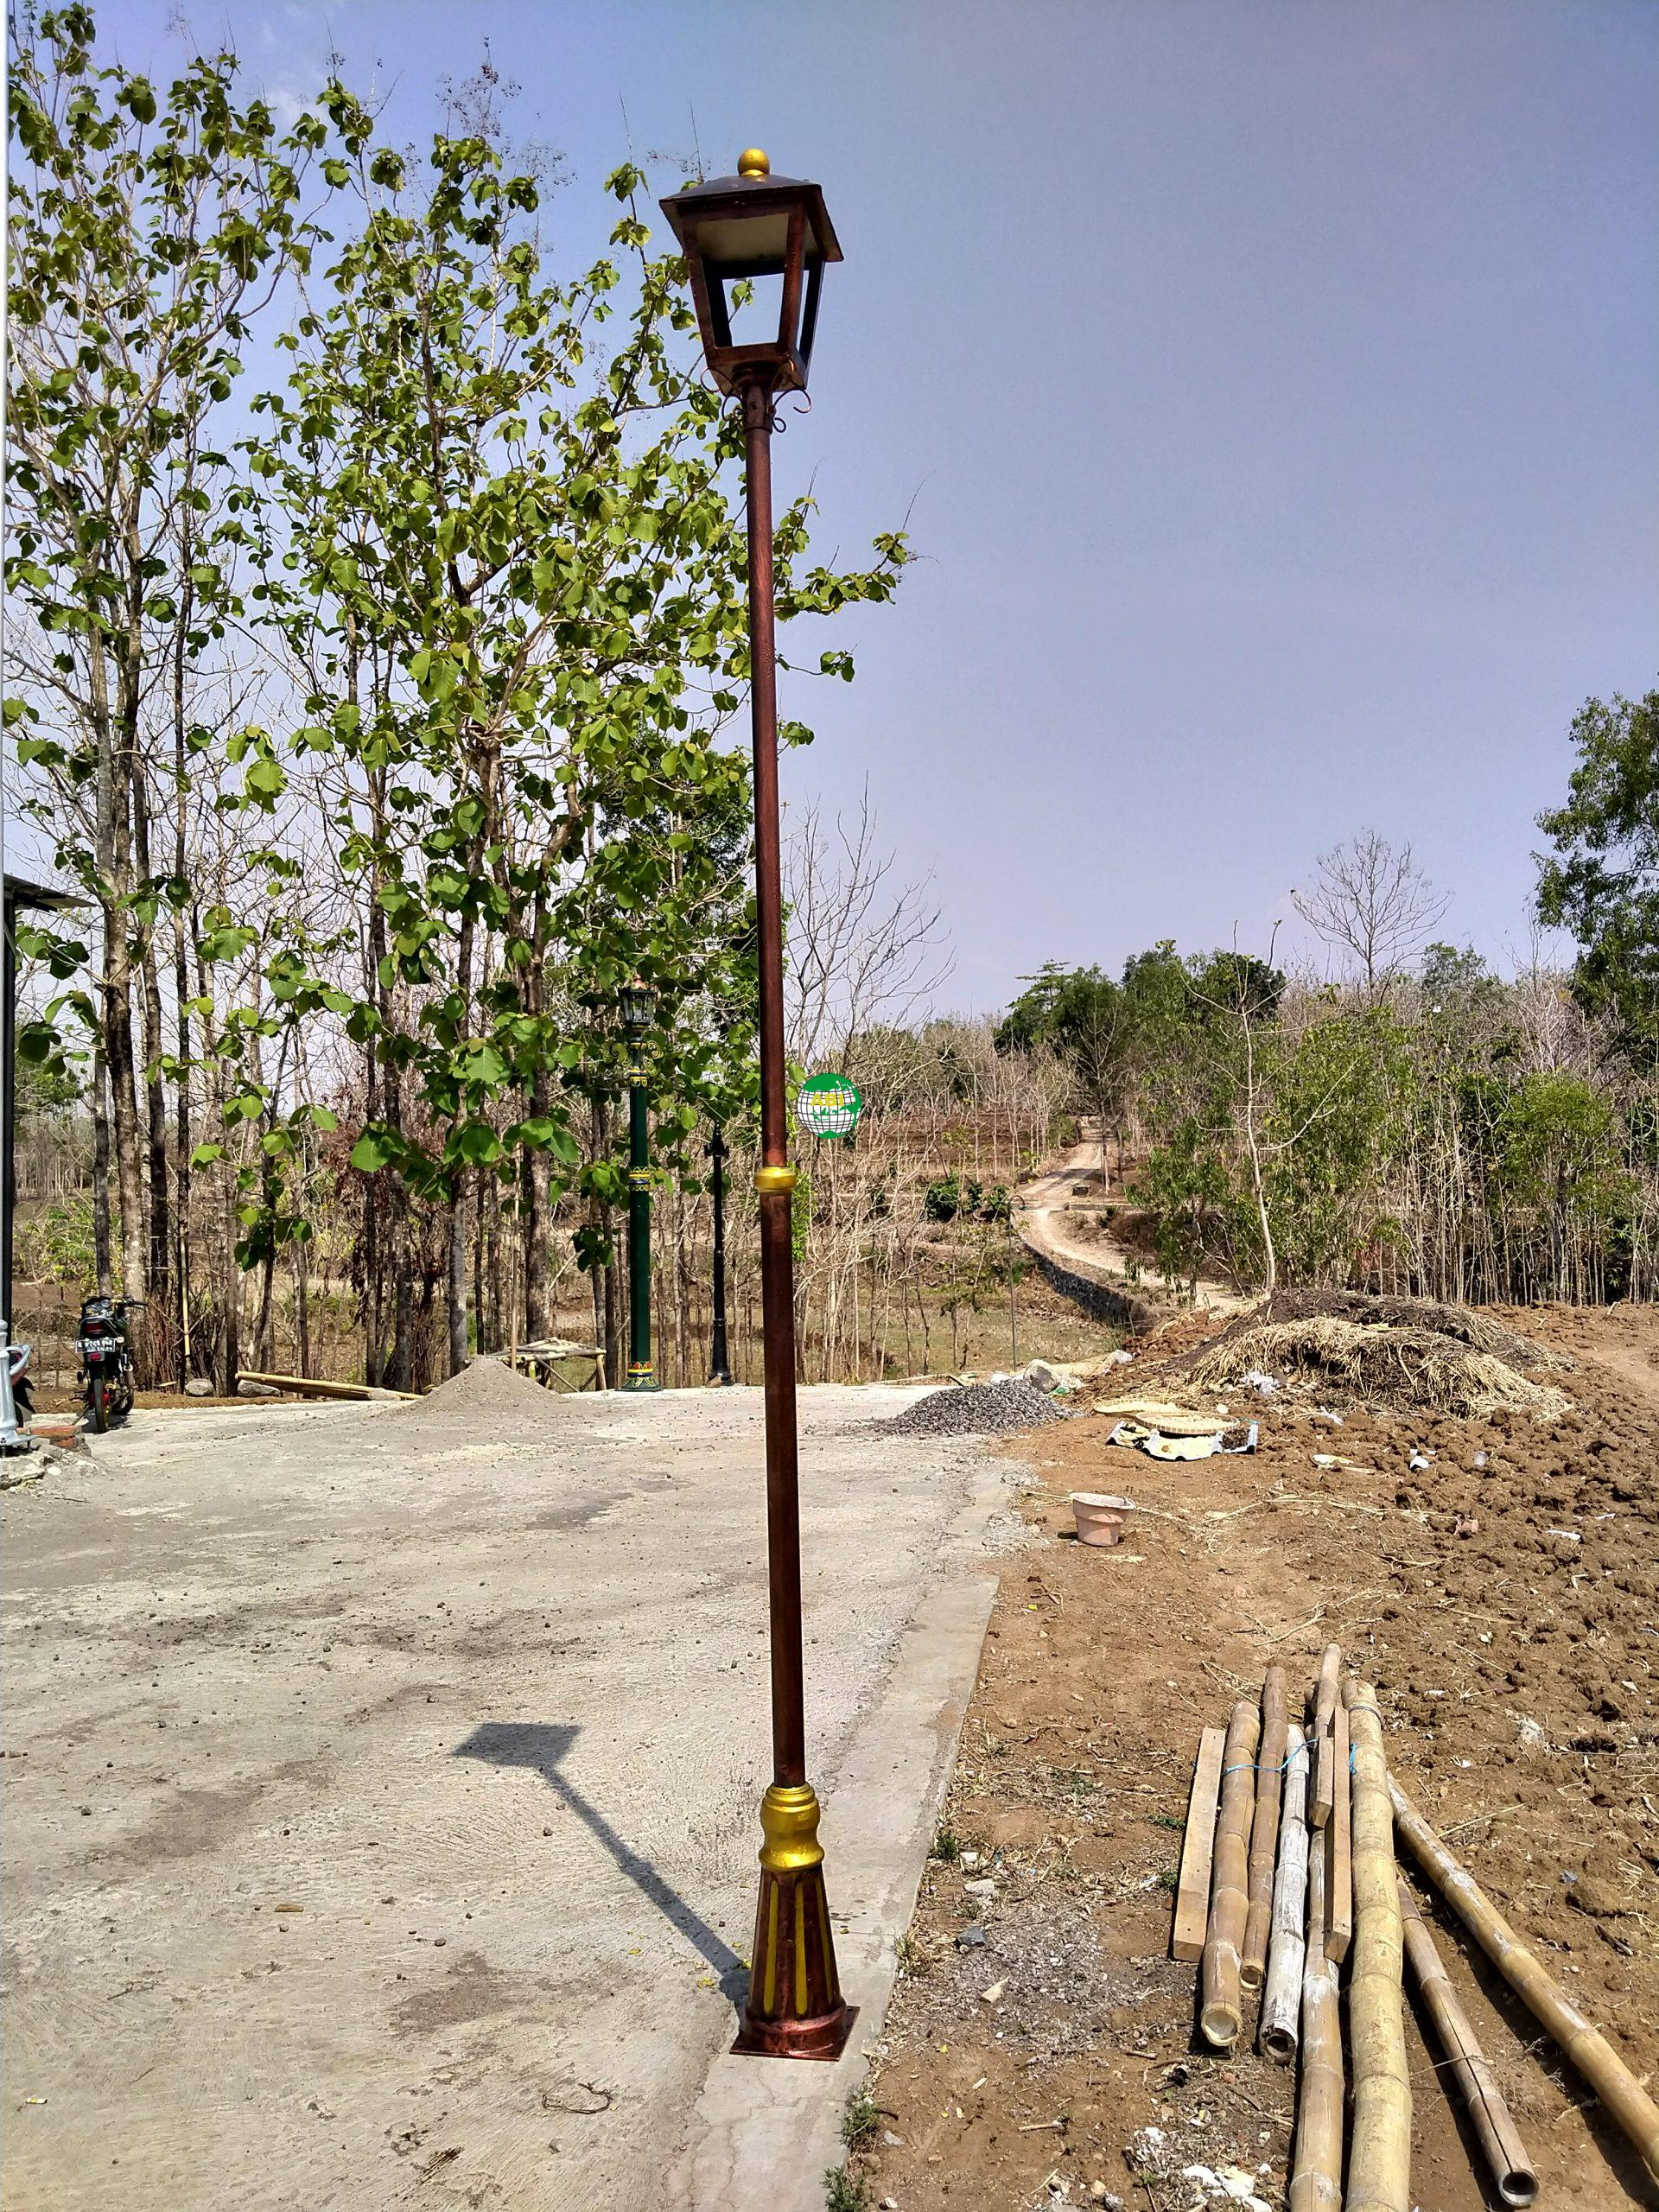 Tiang Lampu Minimalis Taman Lampu Taman Potret Tangerang Murah